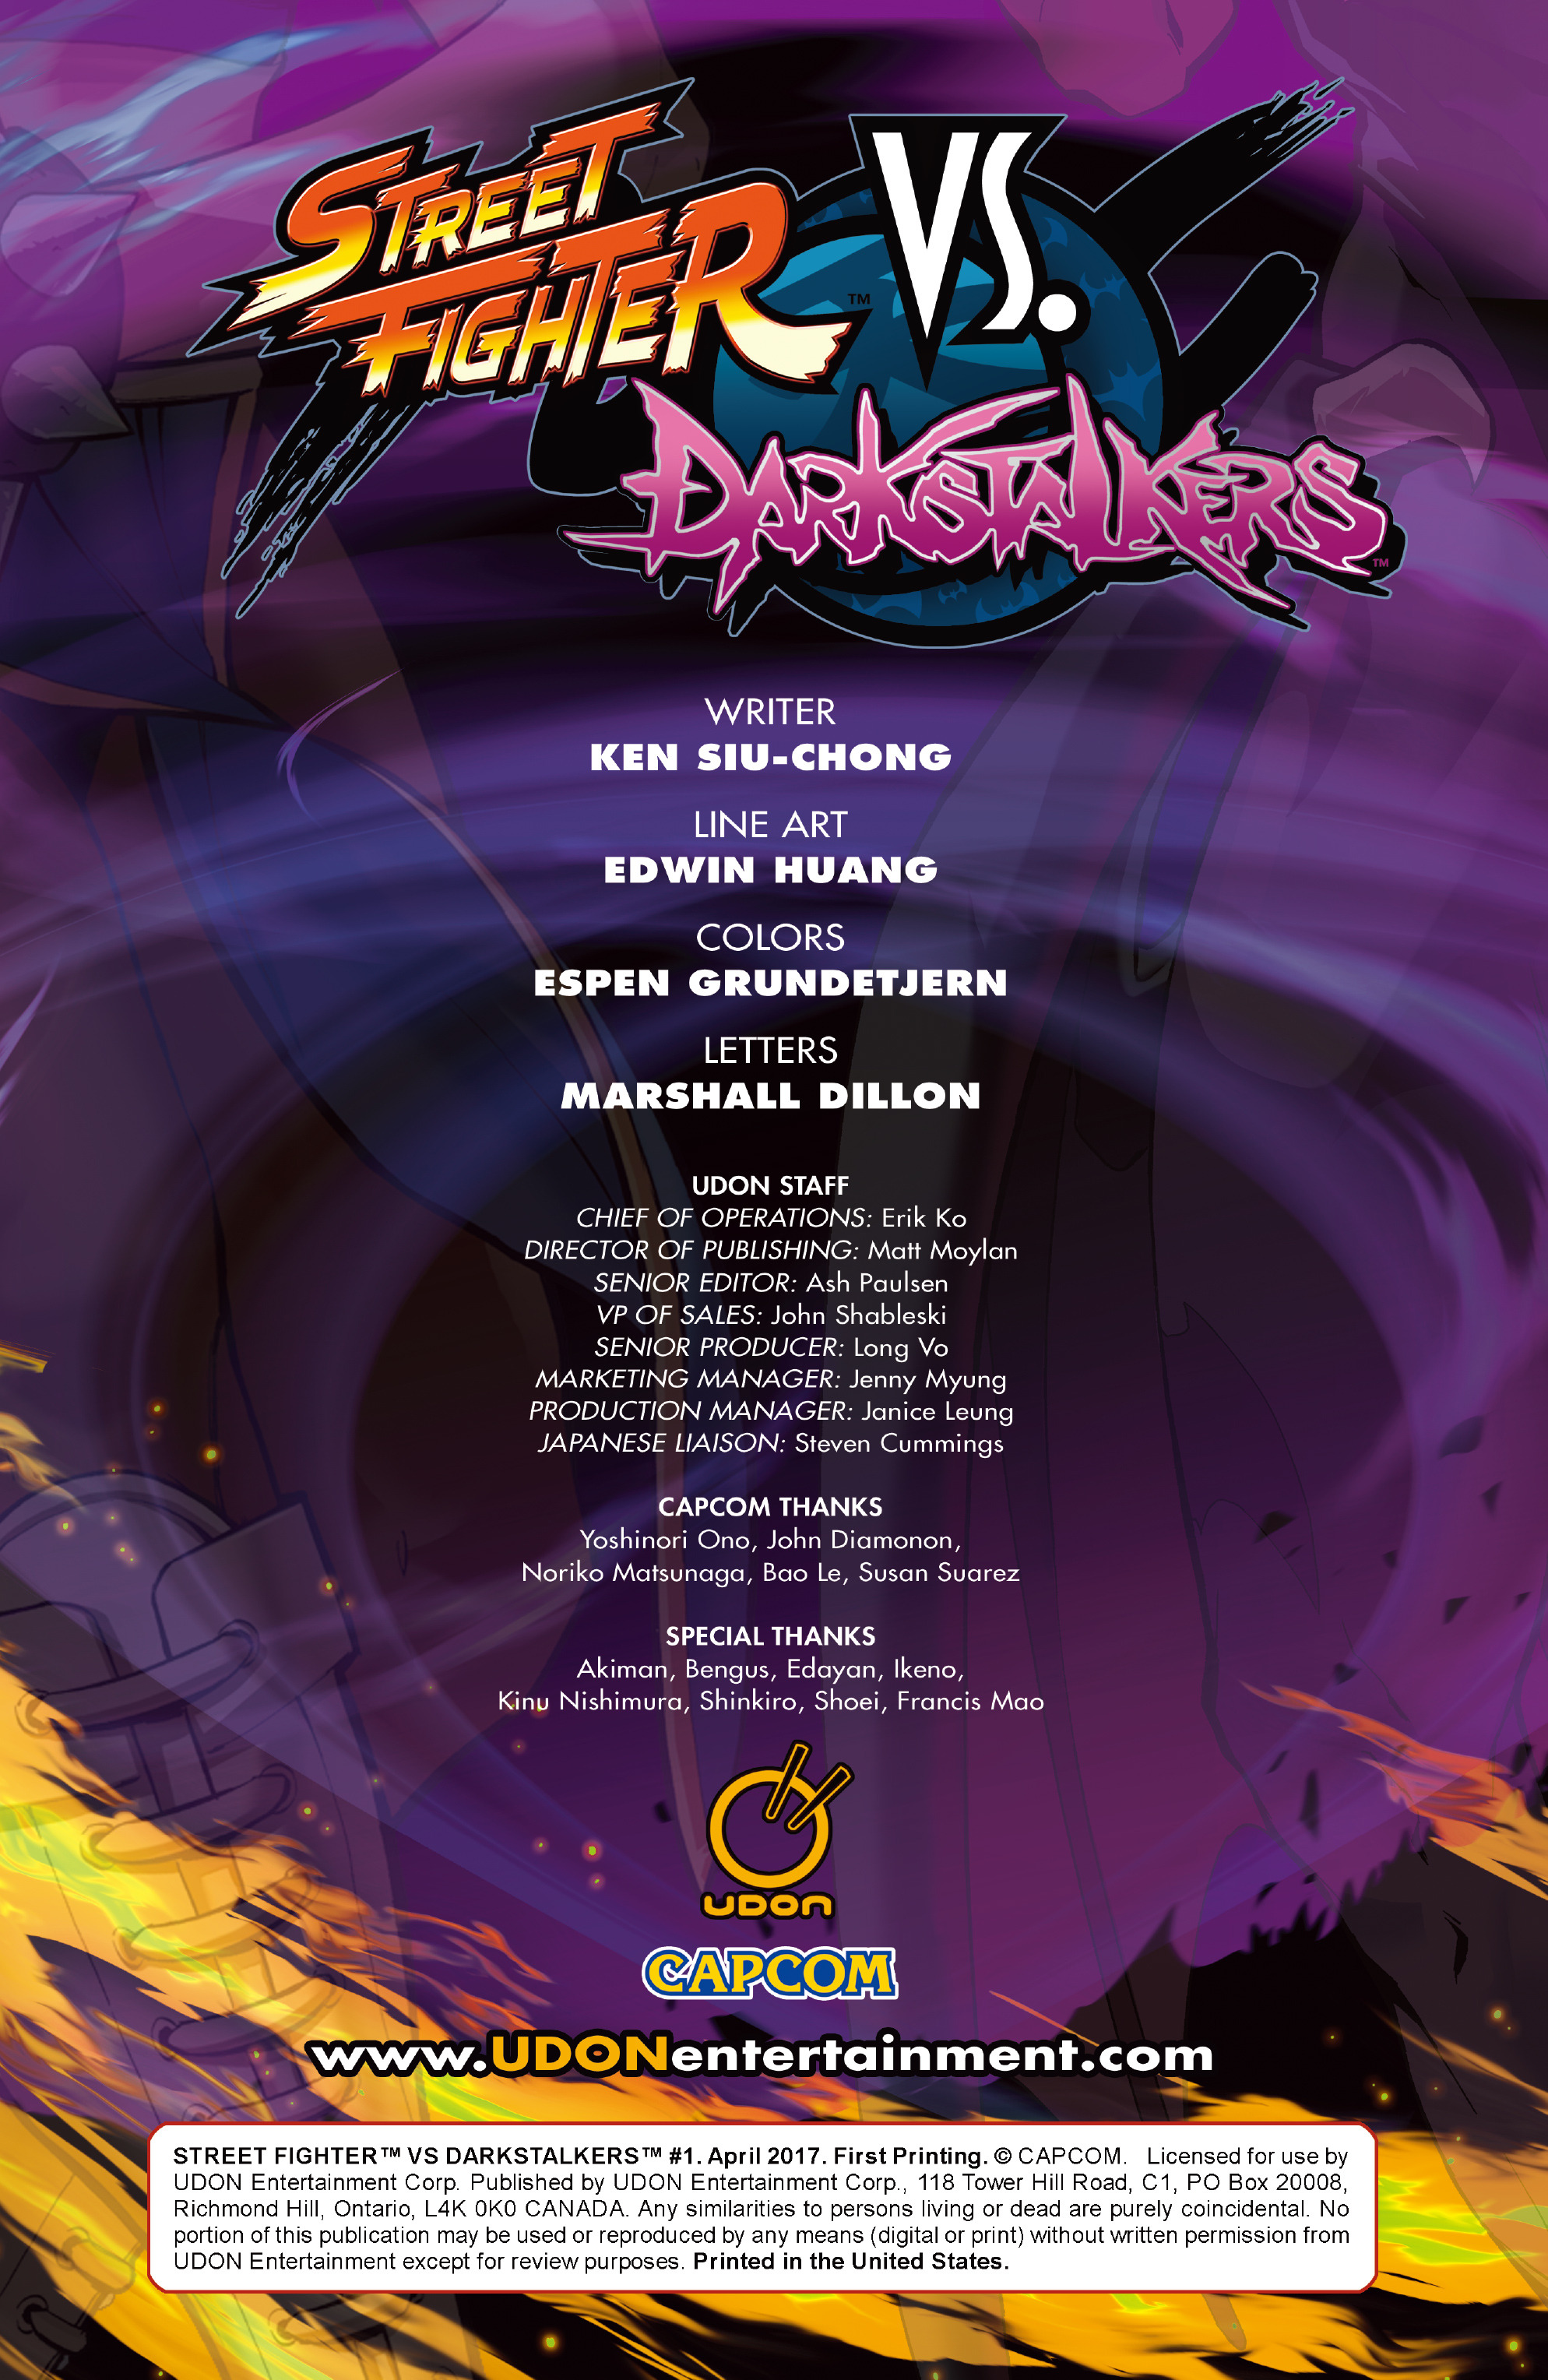 Read online Street Fighter VS Darkstalkers comic -  Issue #1 - 2